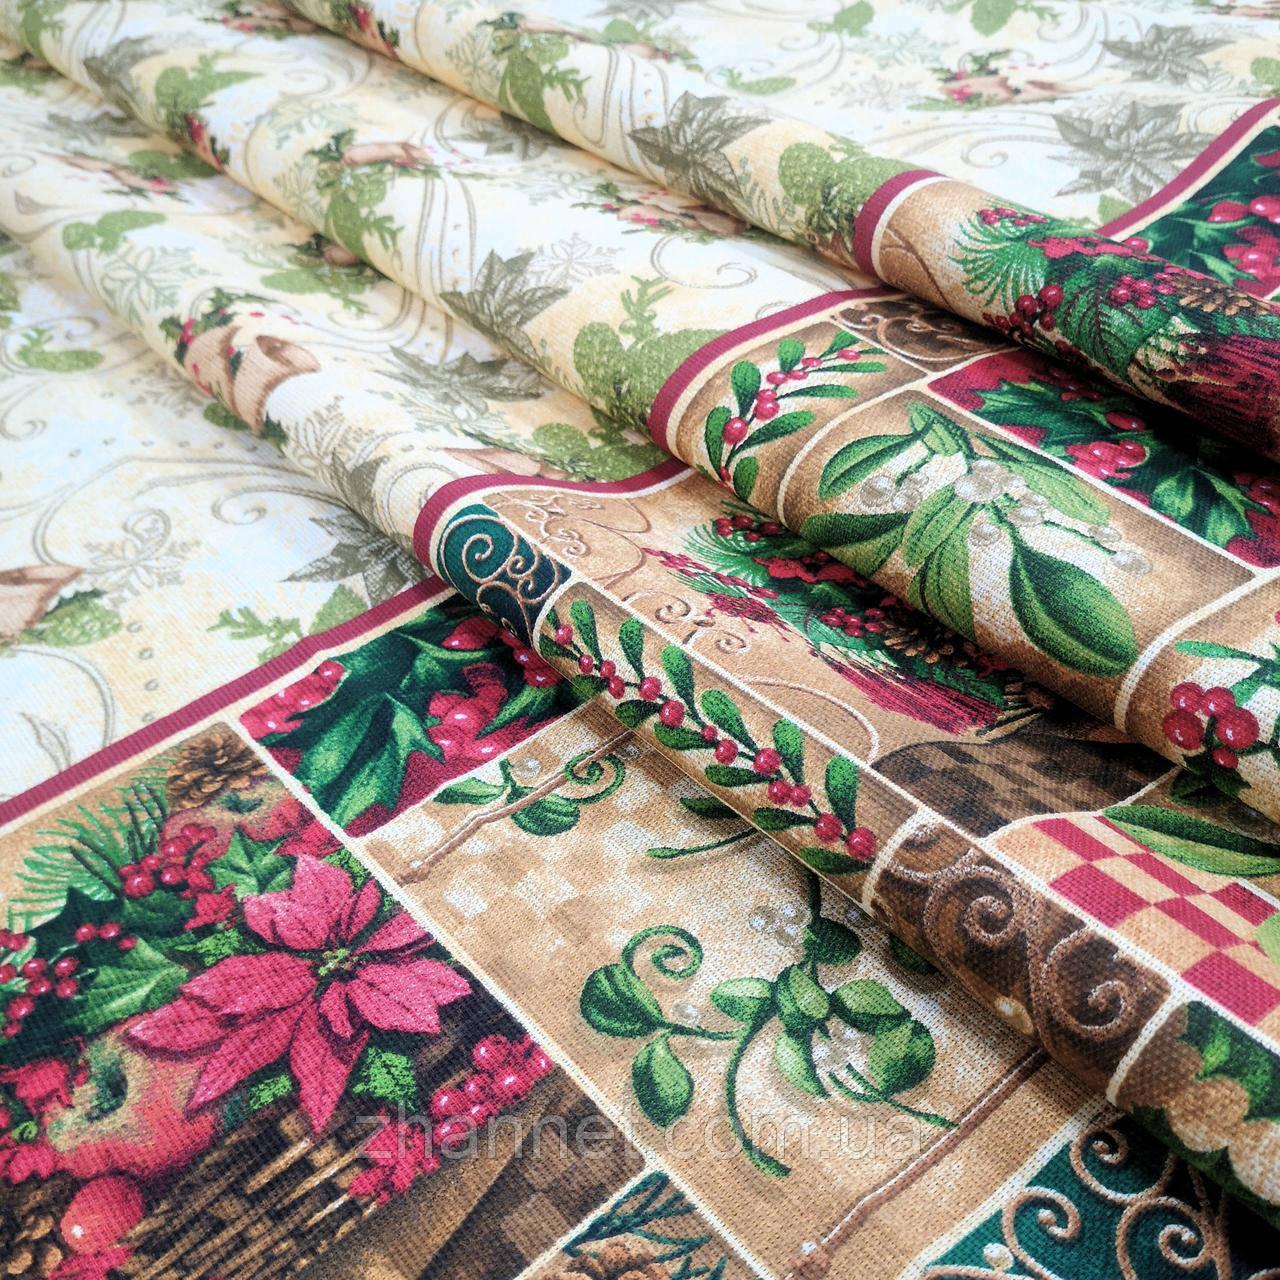 Ткань для новогодней скатерти рогожка Винтаж 150 см